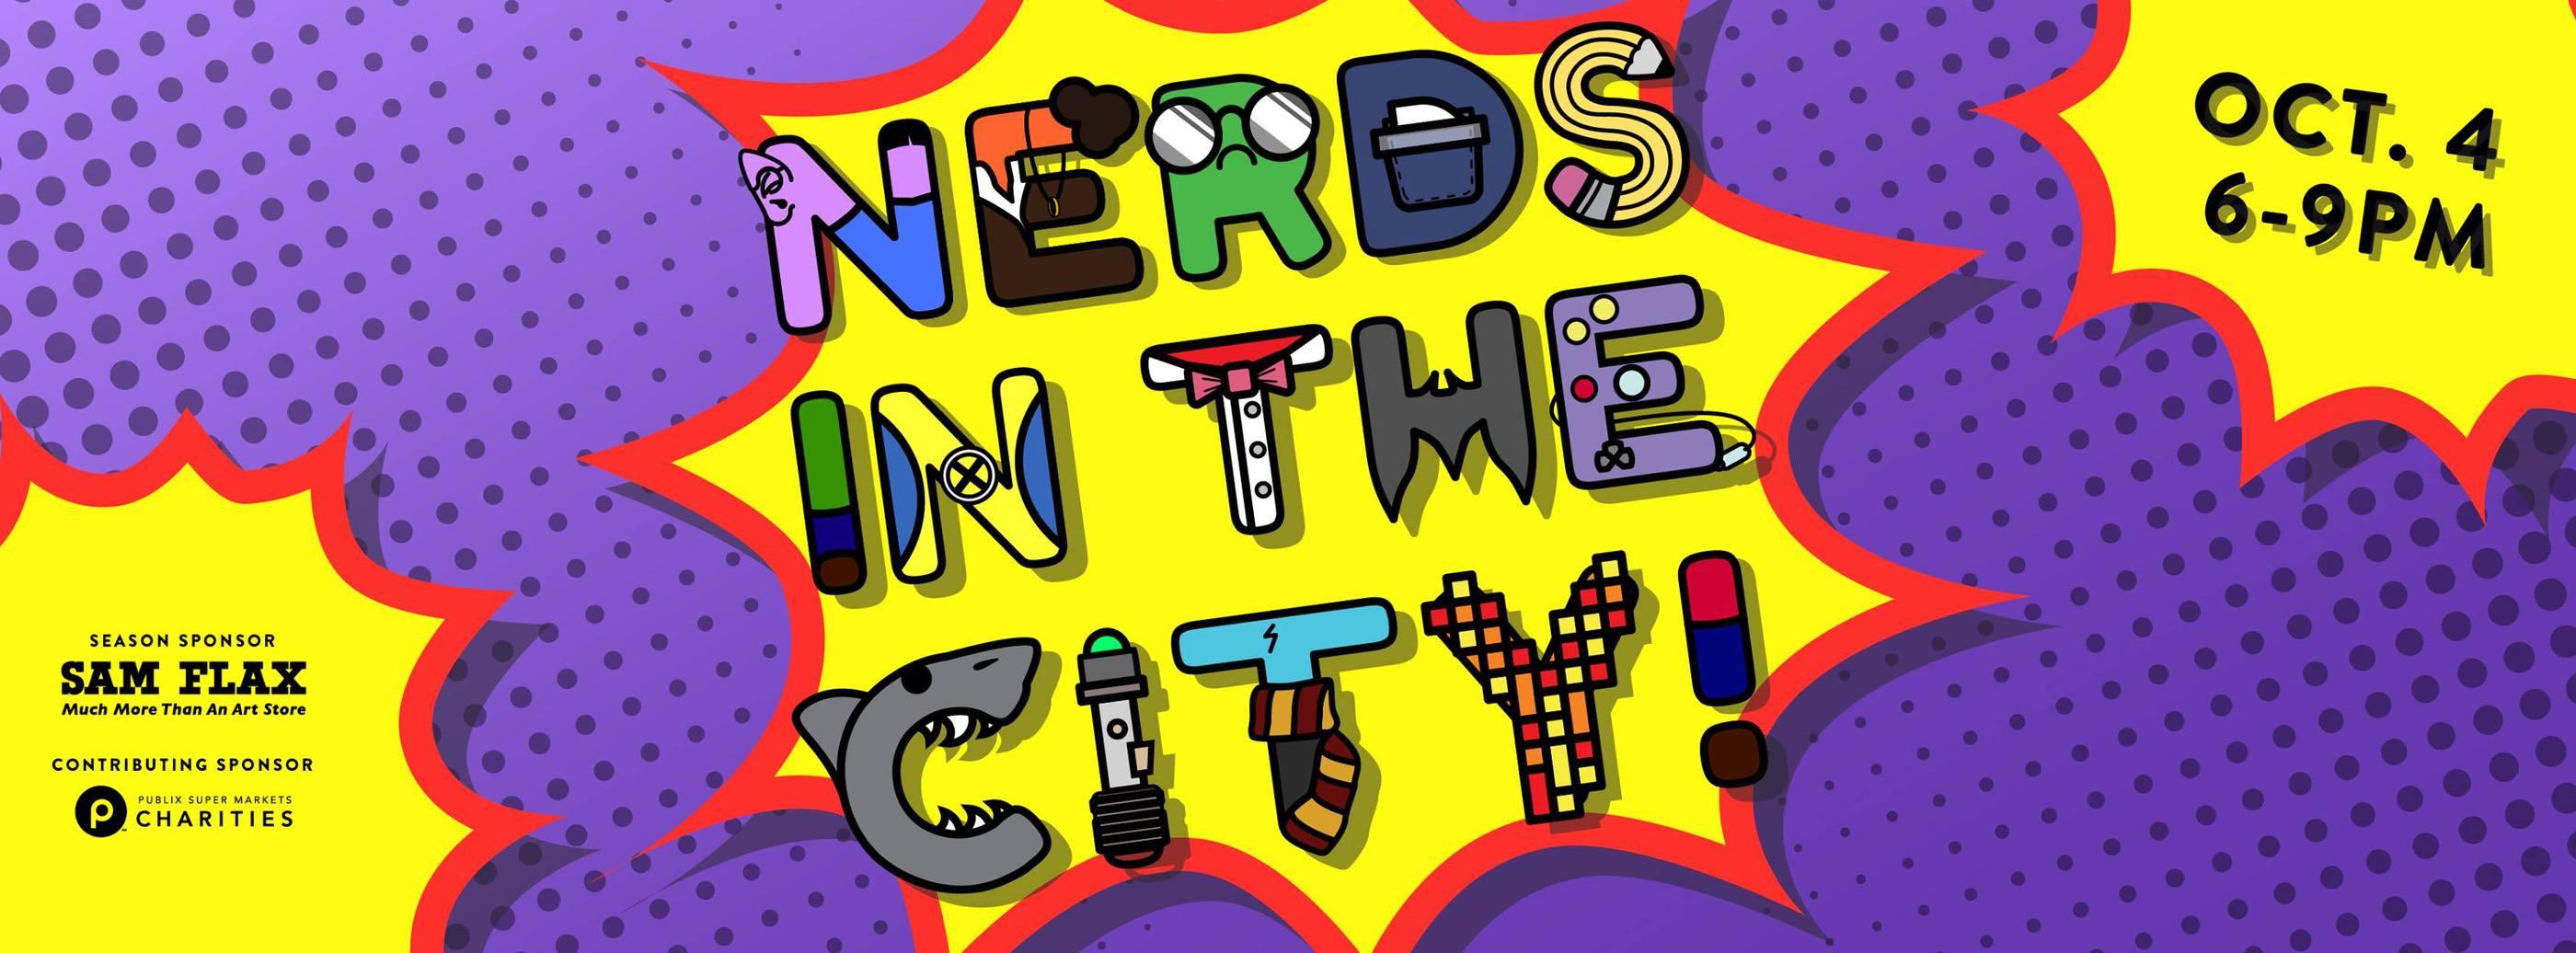 T-Wrecks at OMA 1st Thursdays: Nerds In The City Art Show